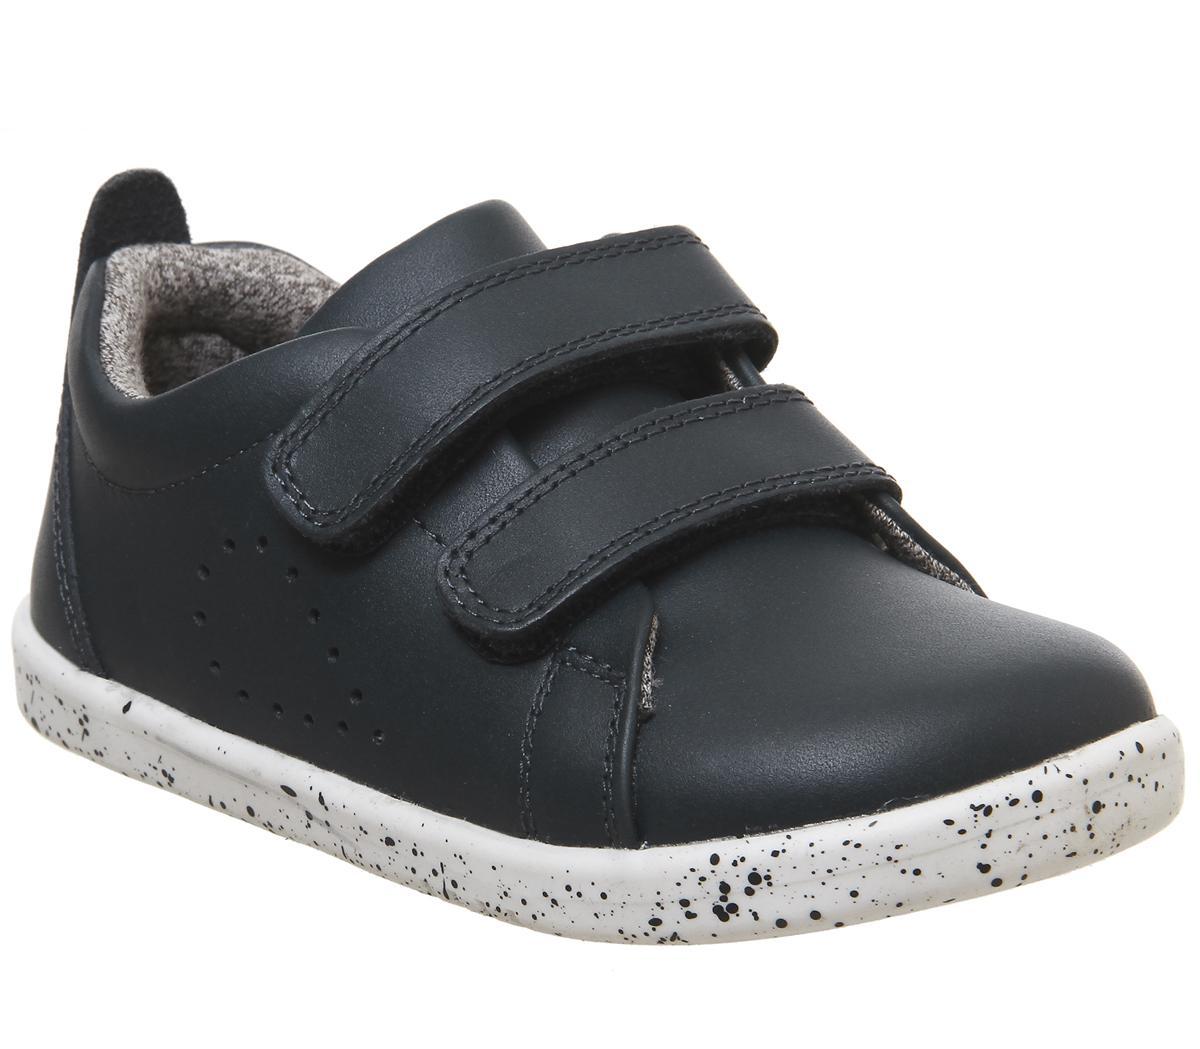 Grass Court Shoes